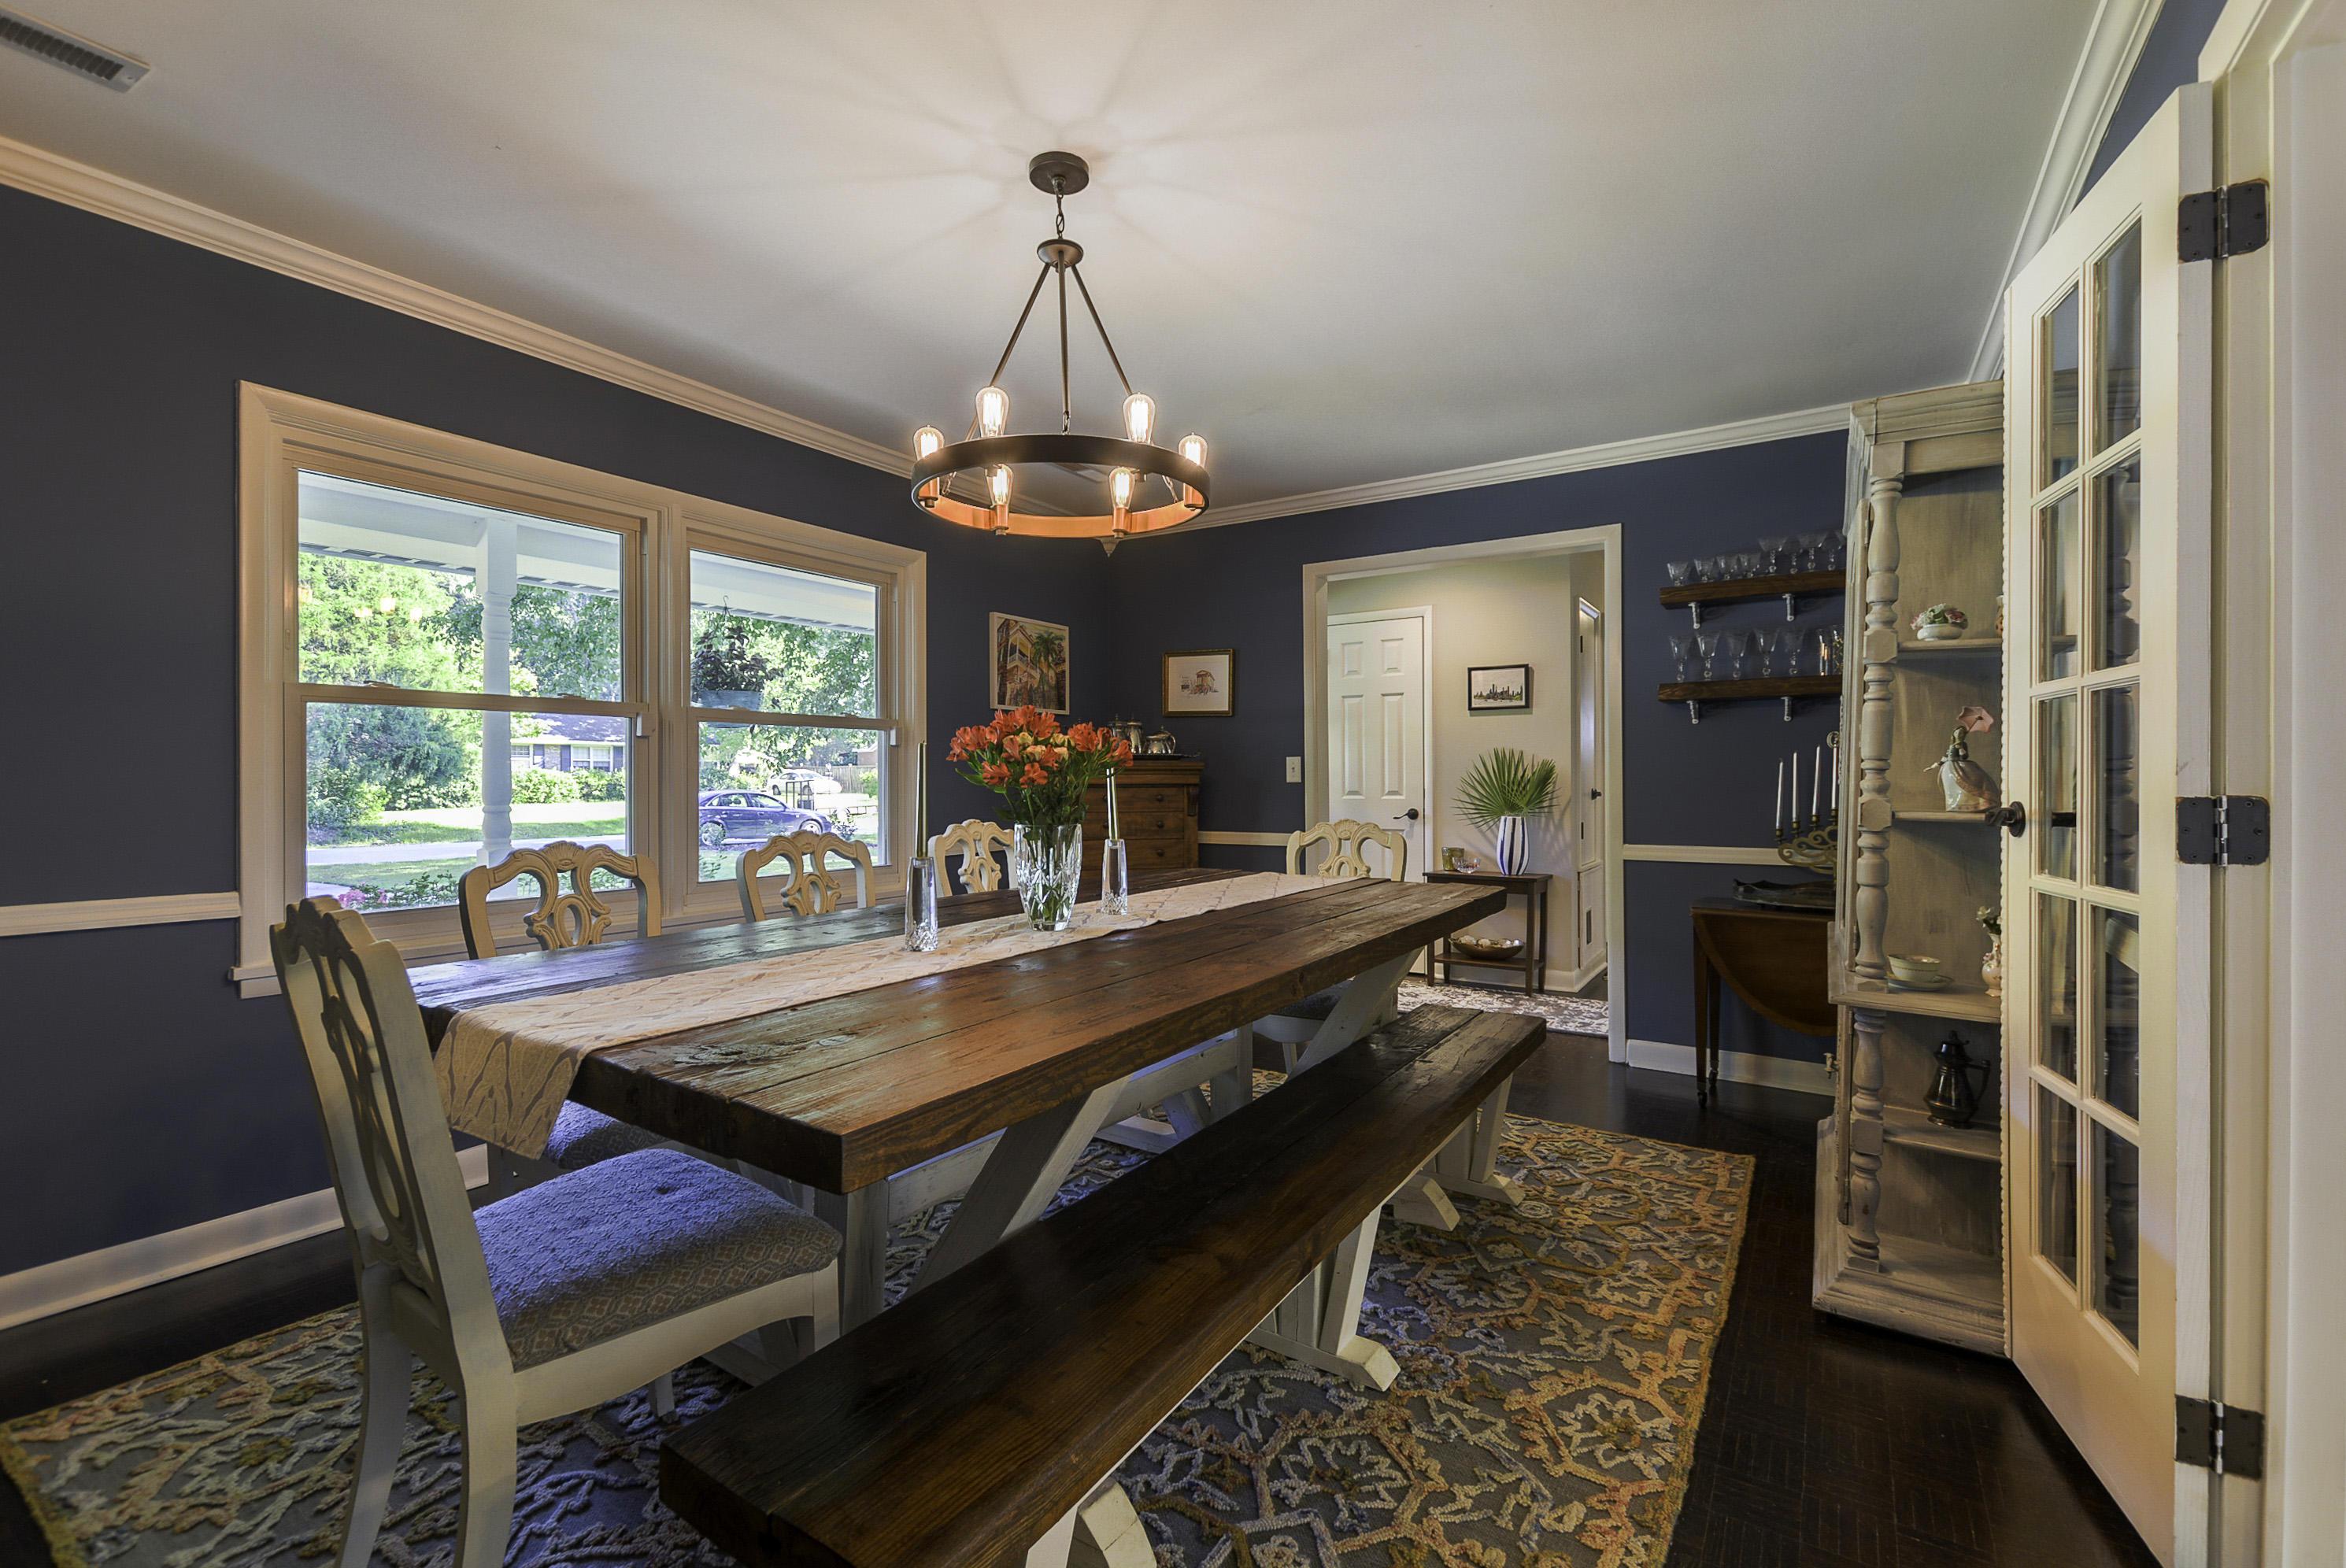 Avian Park Homes For Sale - 1212 Penny, Mount Pleasant, SC - 5